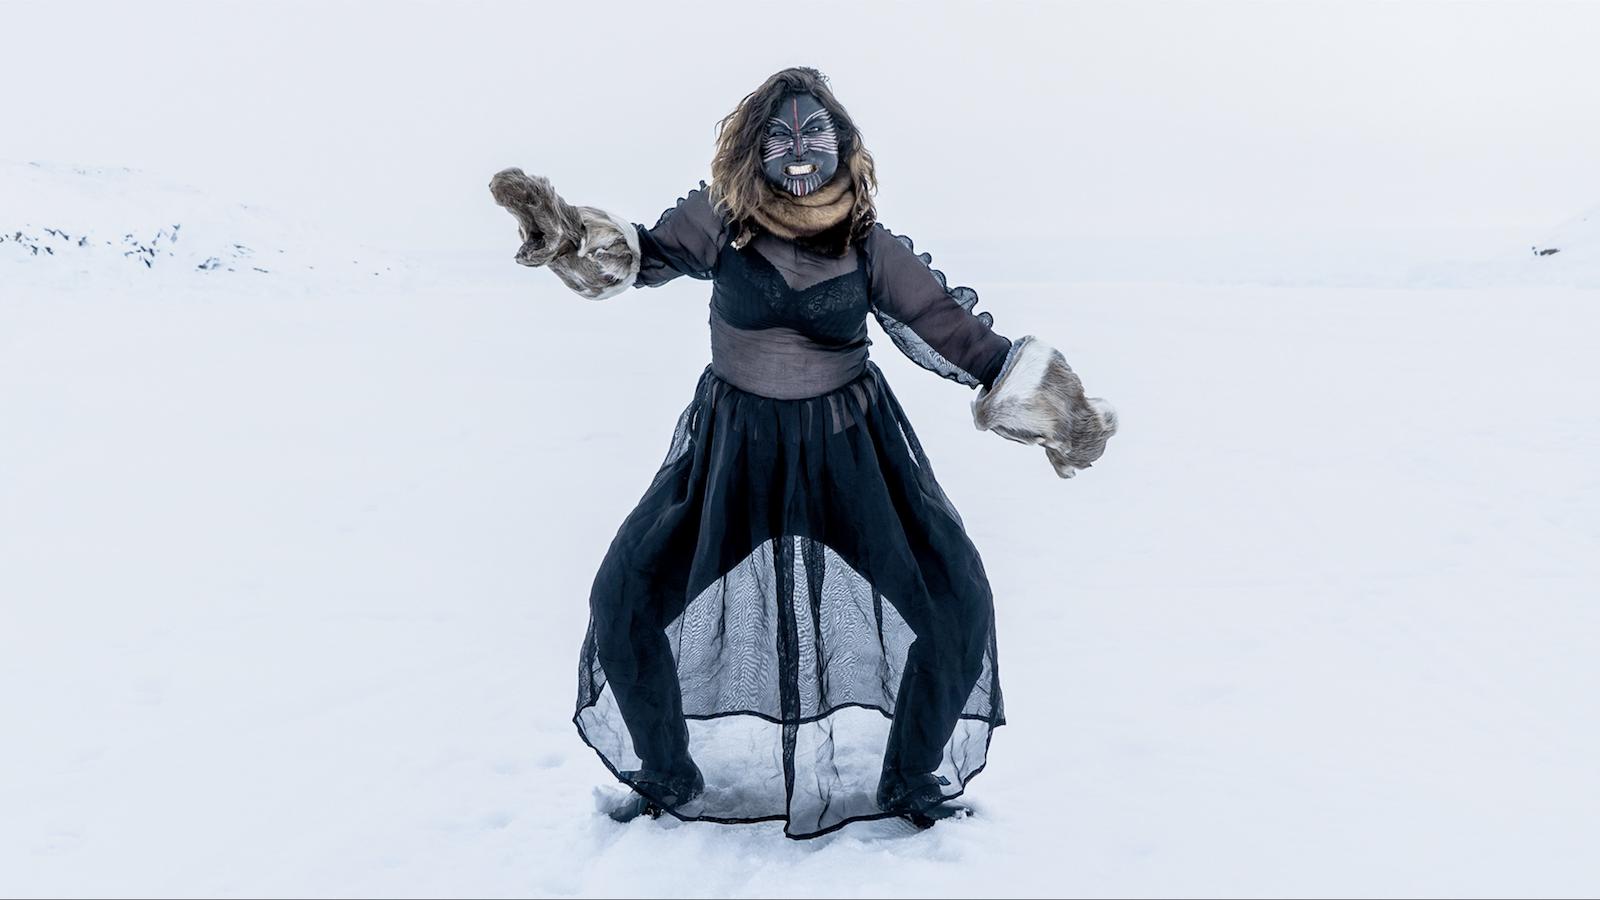 Greenland Inuit Mask dance ujeerneq